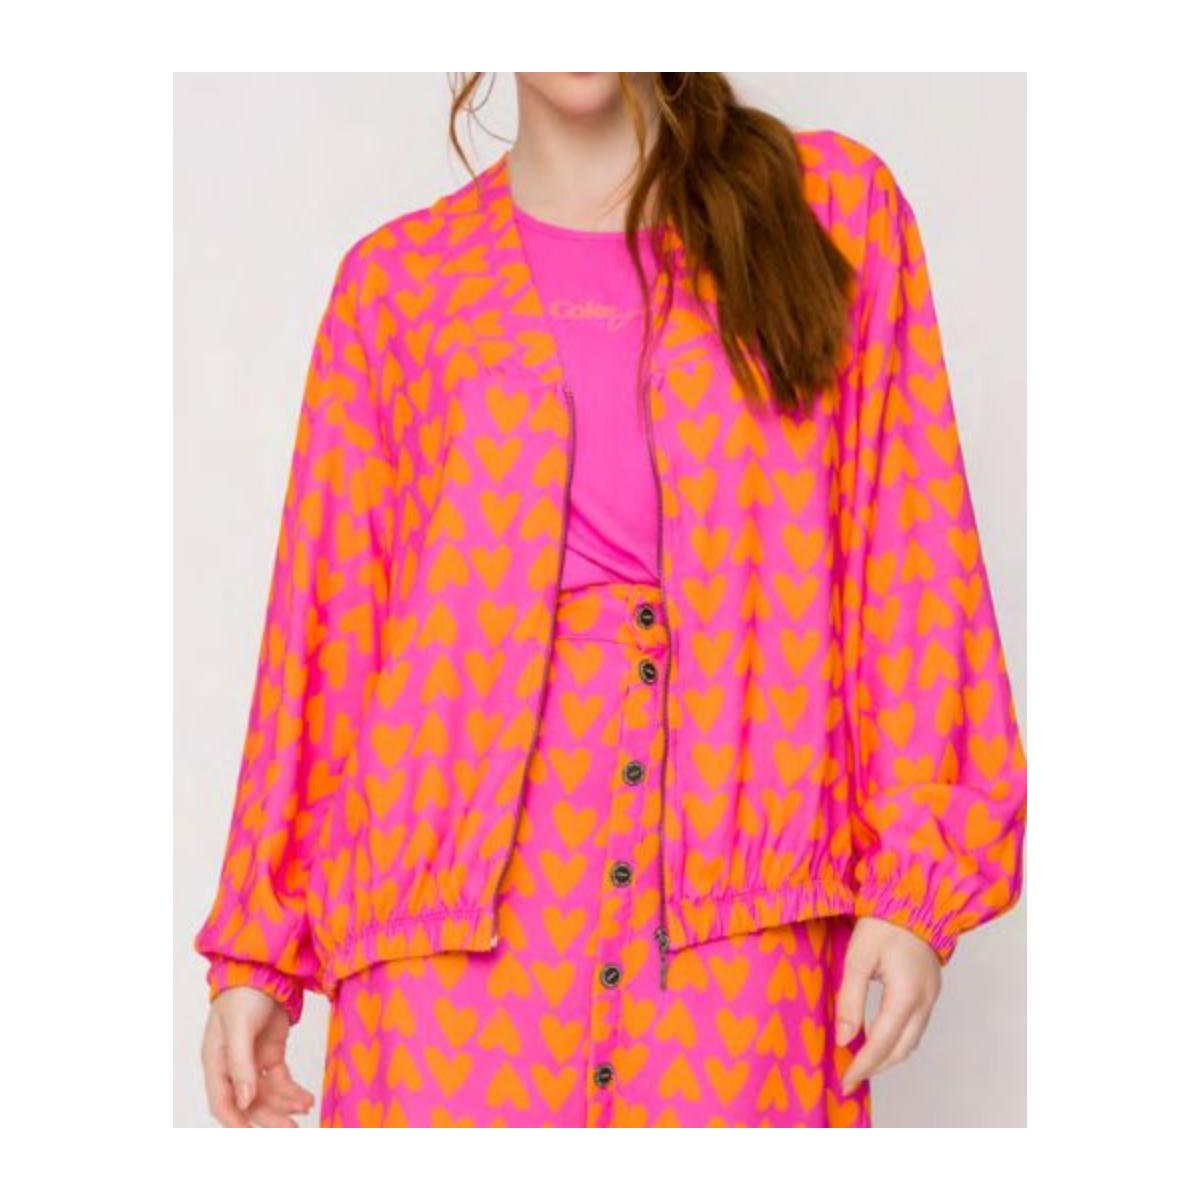 Jaqueta Feminina Coca-cola Clothing 323200641 Vb101 Pink/laranja